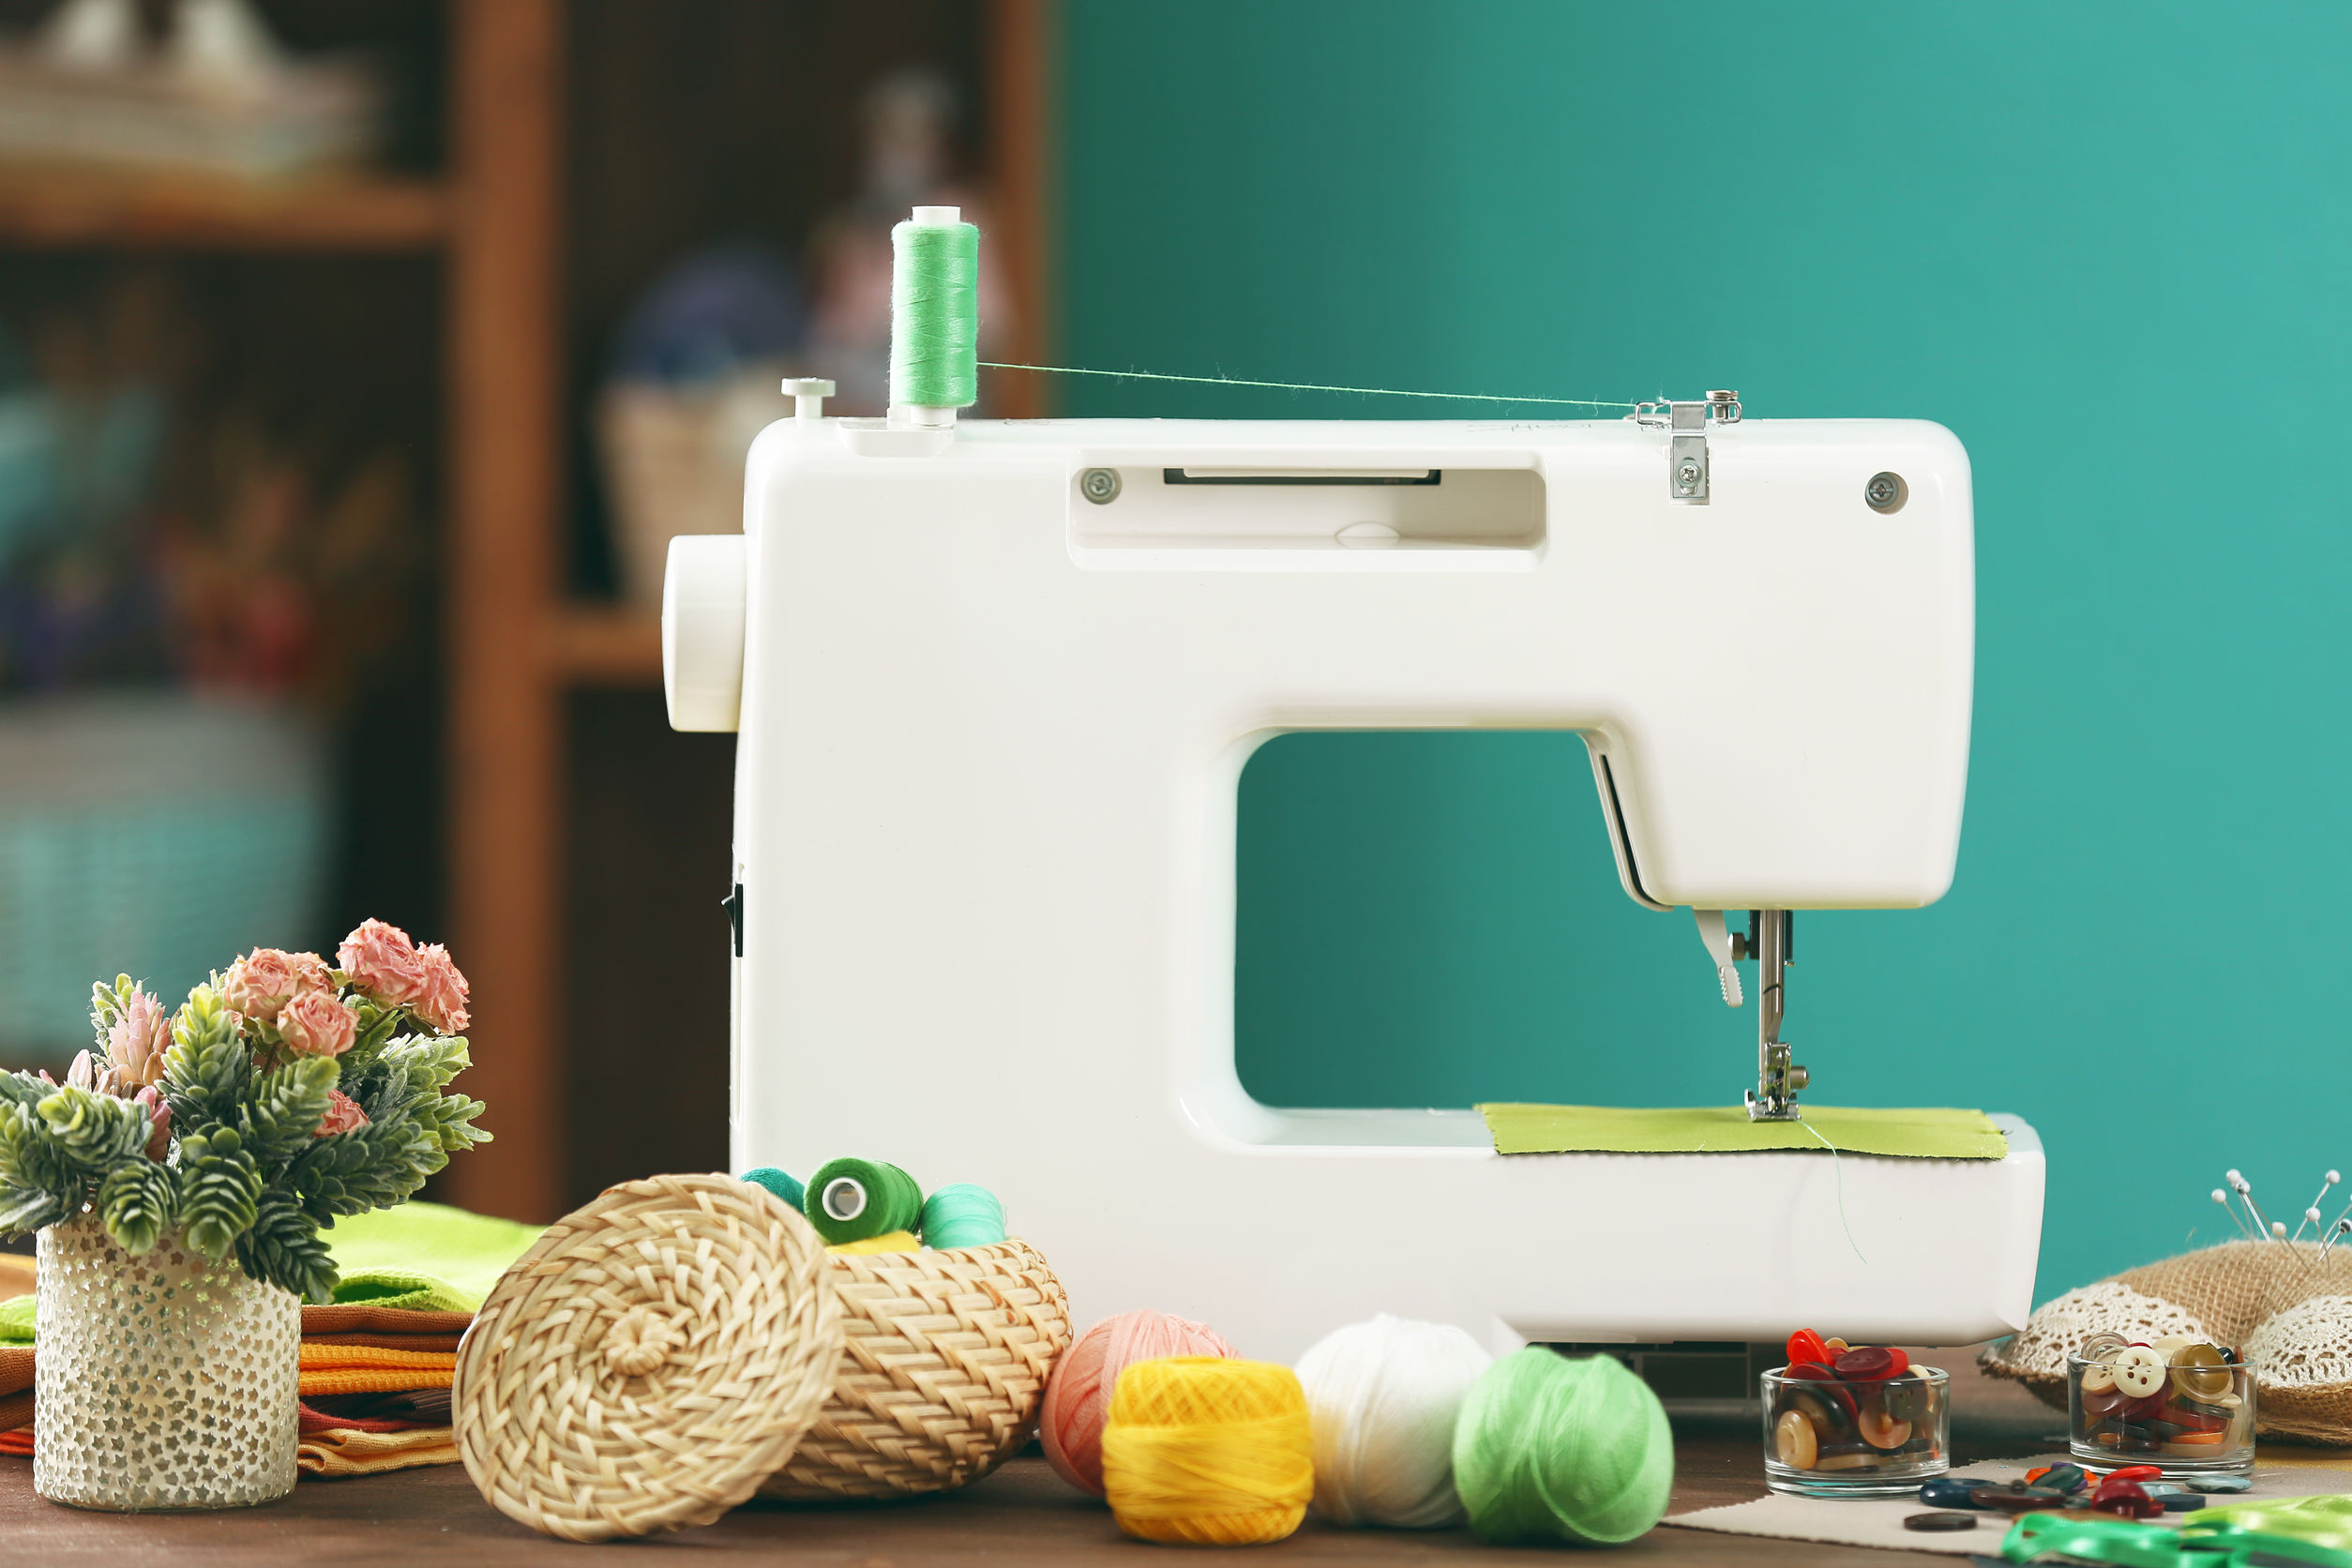 Máquina de coser Brother: ¿Cuál es la mejor del 2020